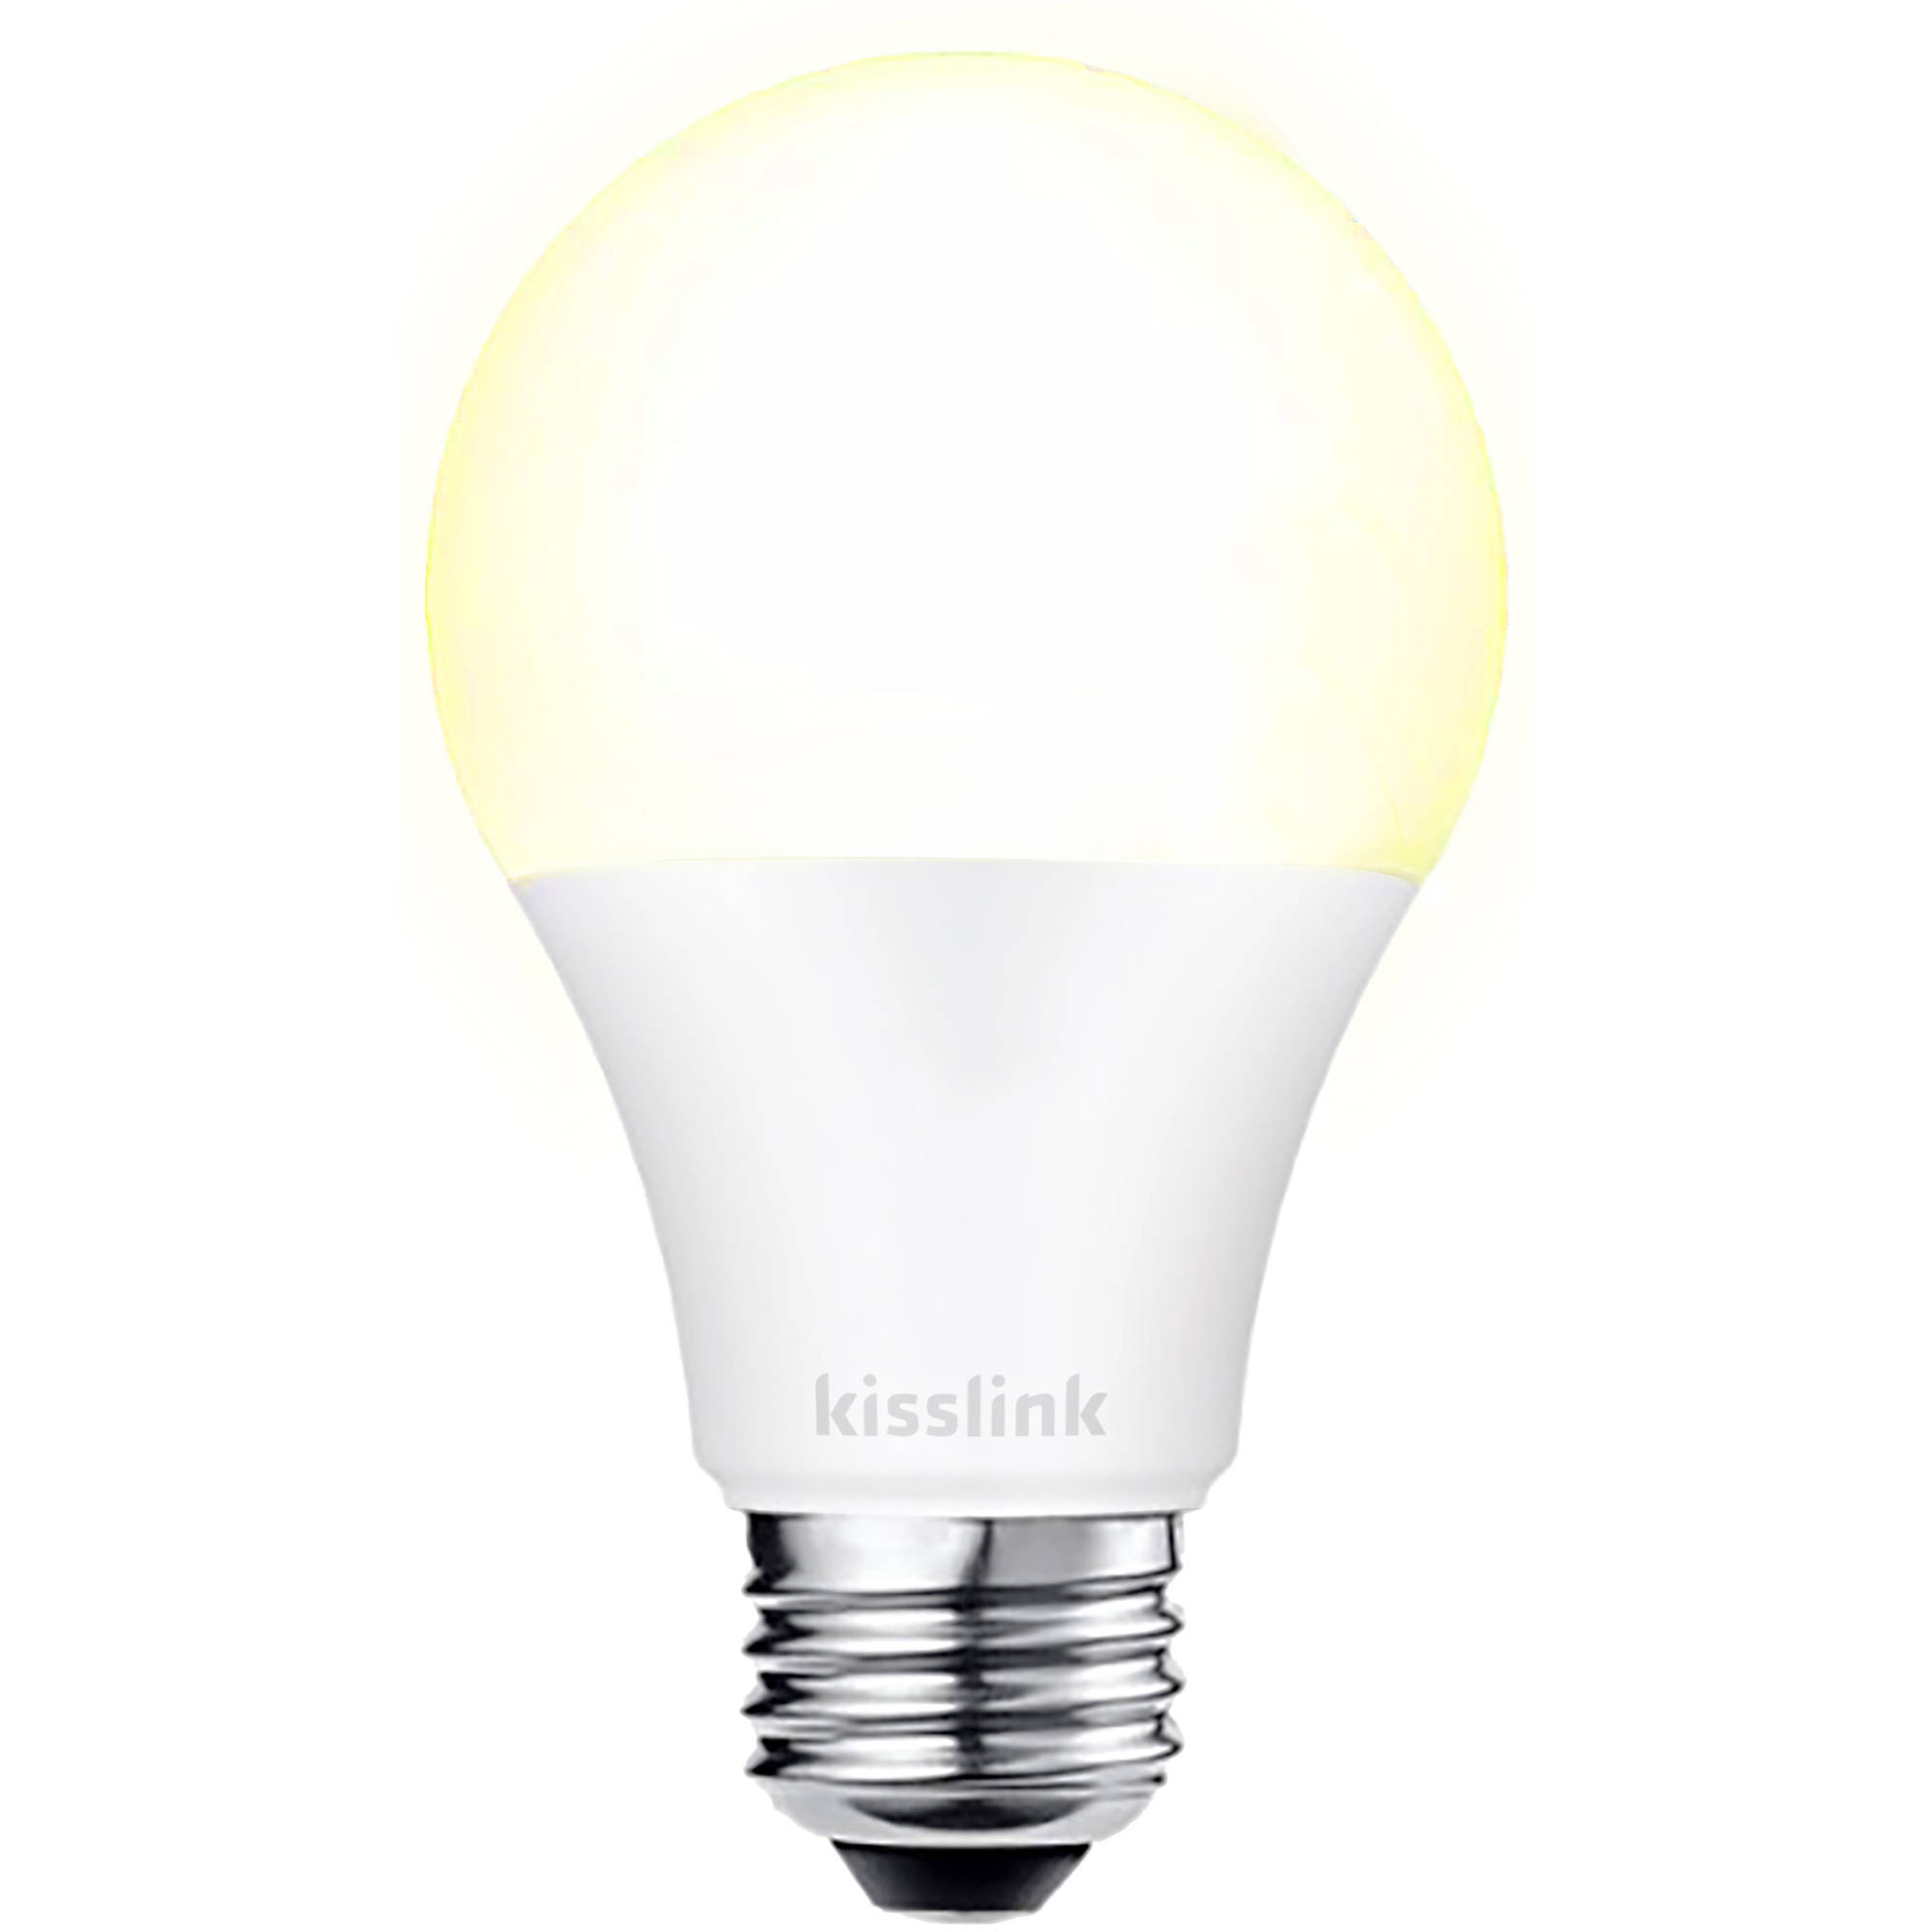 keewifi kisslink wi fi led smart bulb white sb200 b h photo. Black Bedroom Furniture Sets. Home Design Ideas